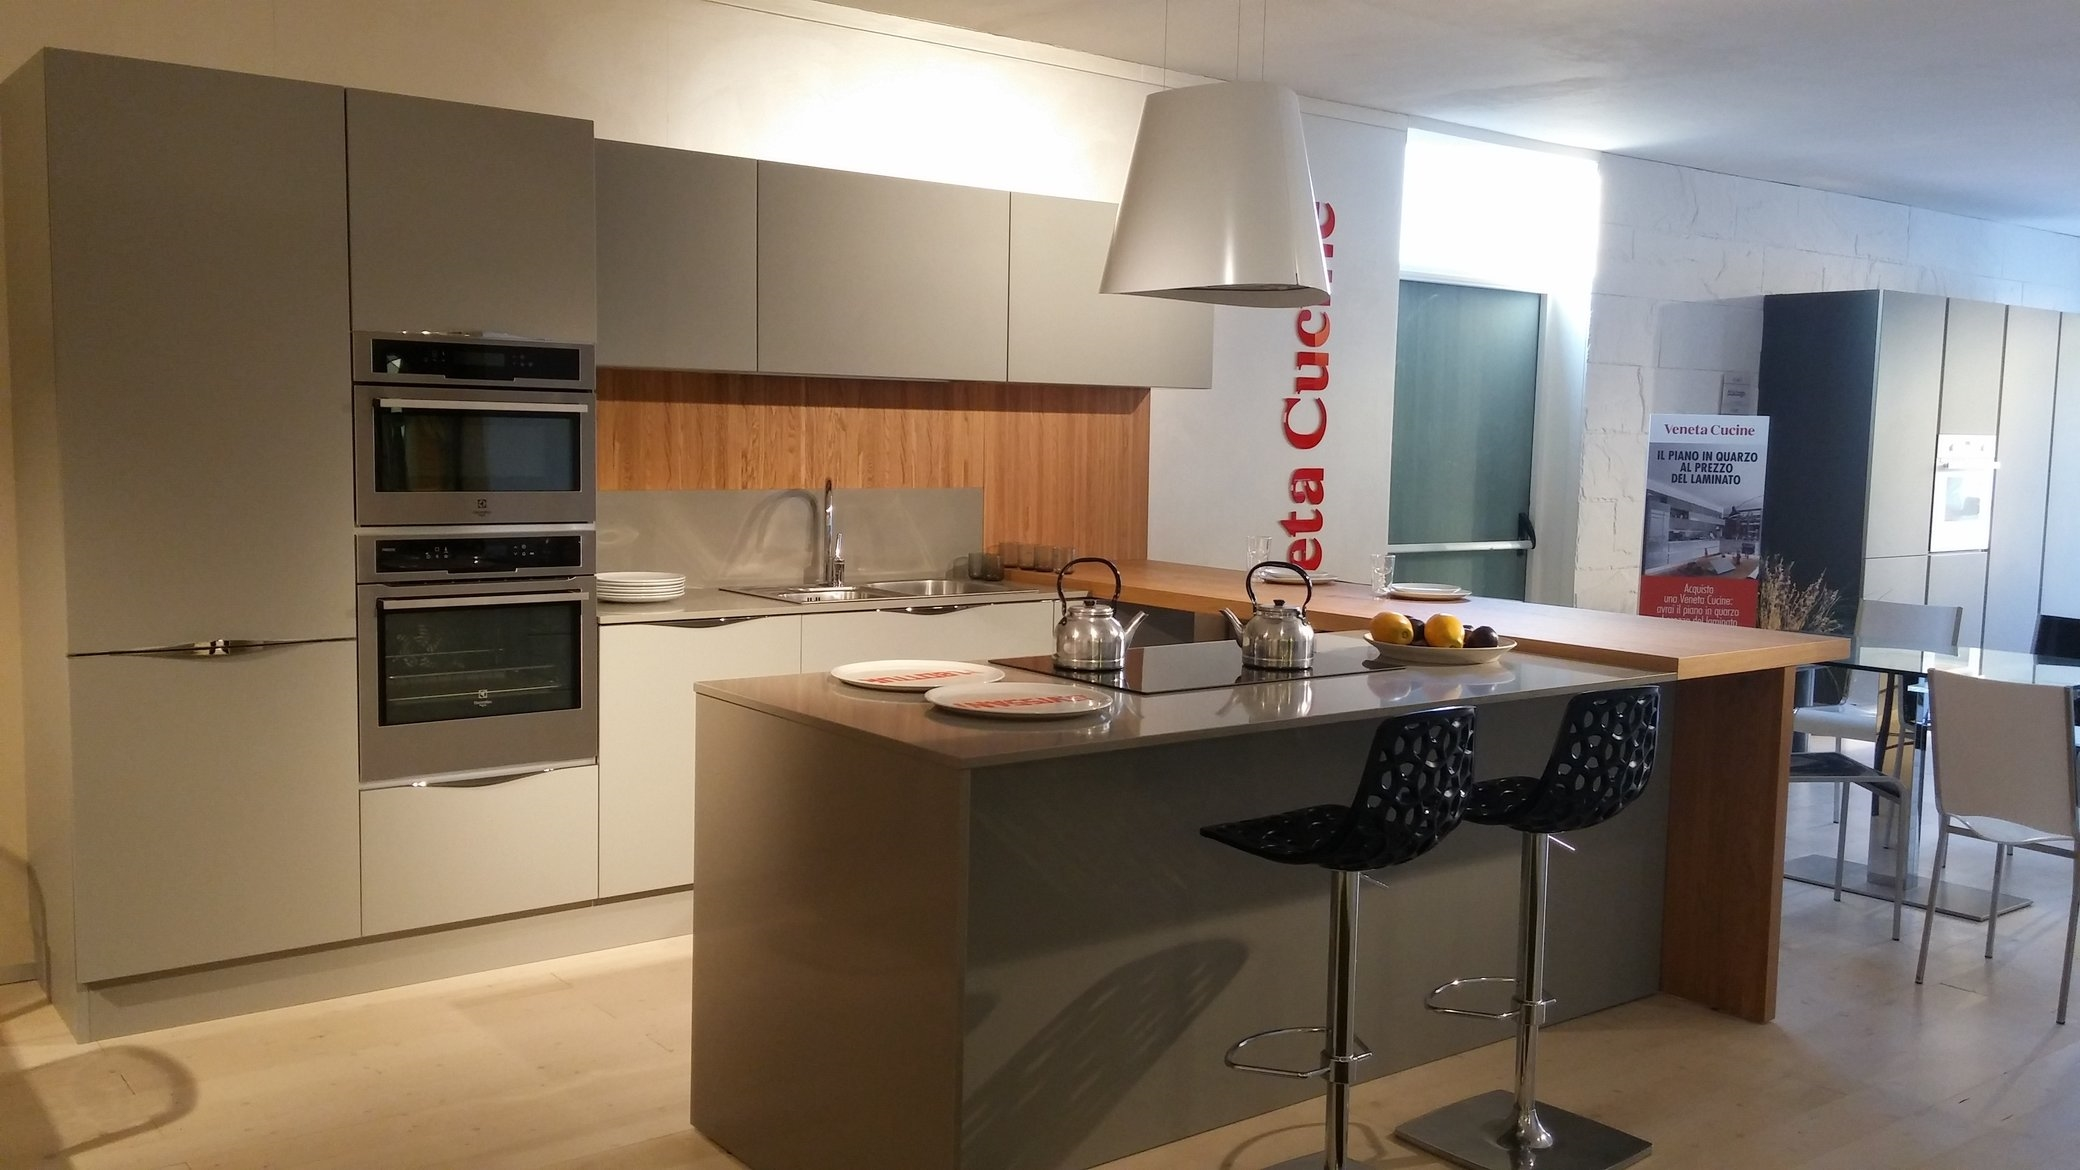 Veneta cucine cucina extra scontato del 51 cucine a - Prezzi veneta cucine ...